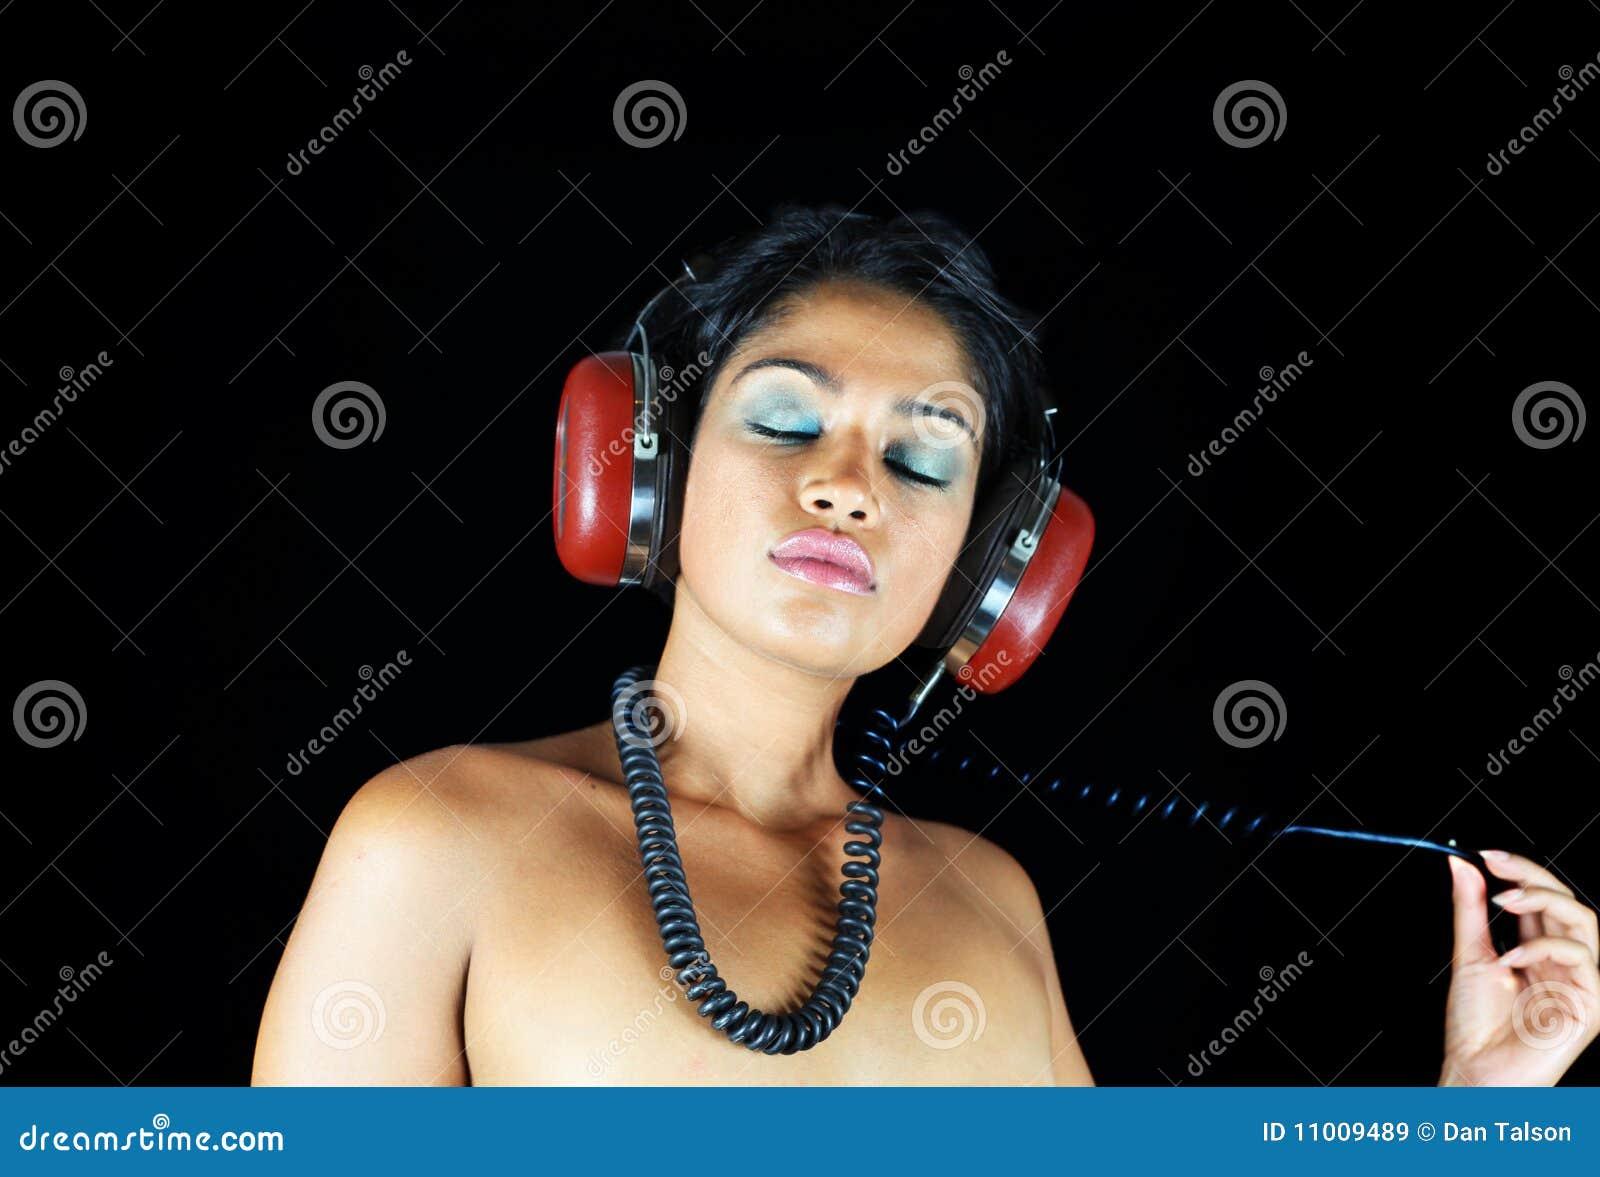 Headphone Girl Stock Image Image Of Deejay Face Sensual